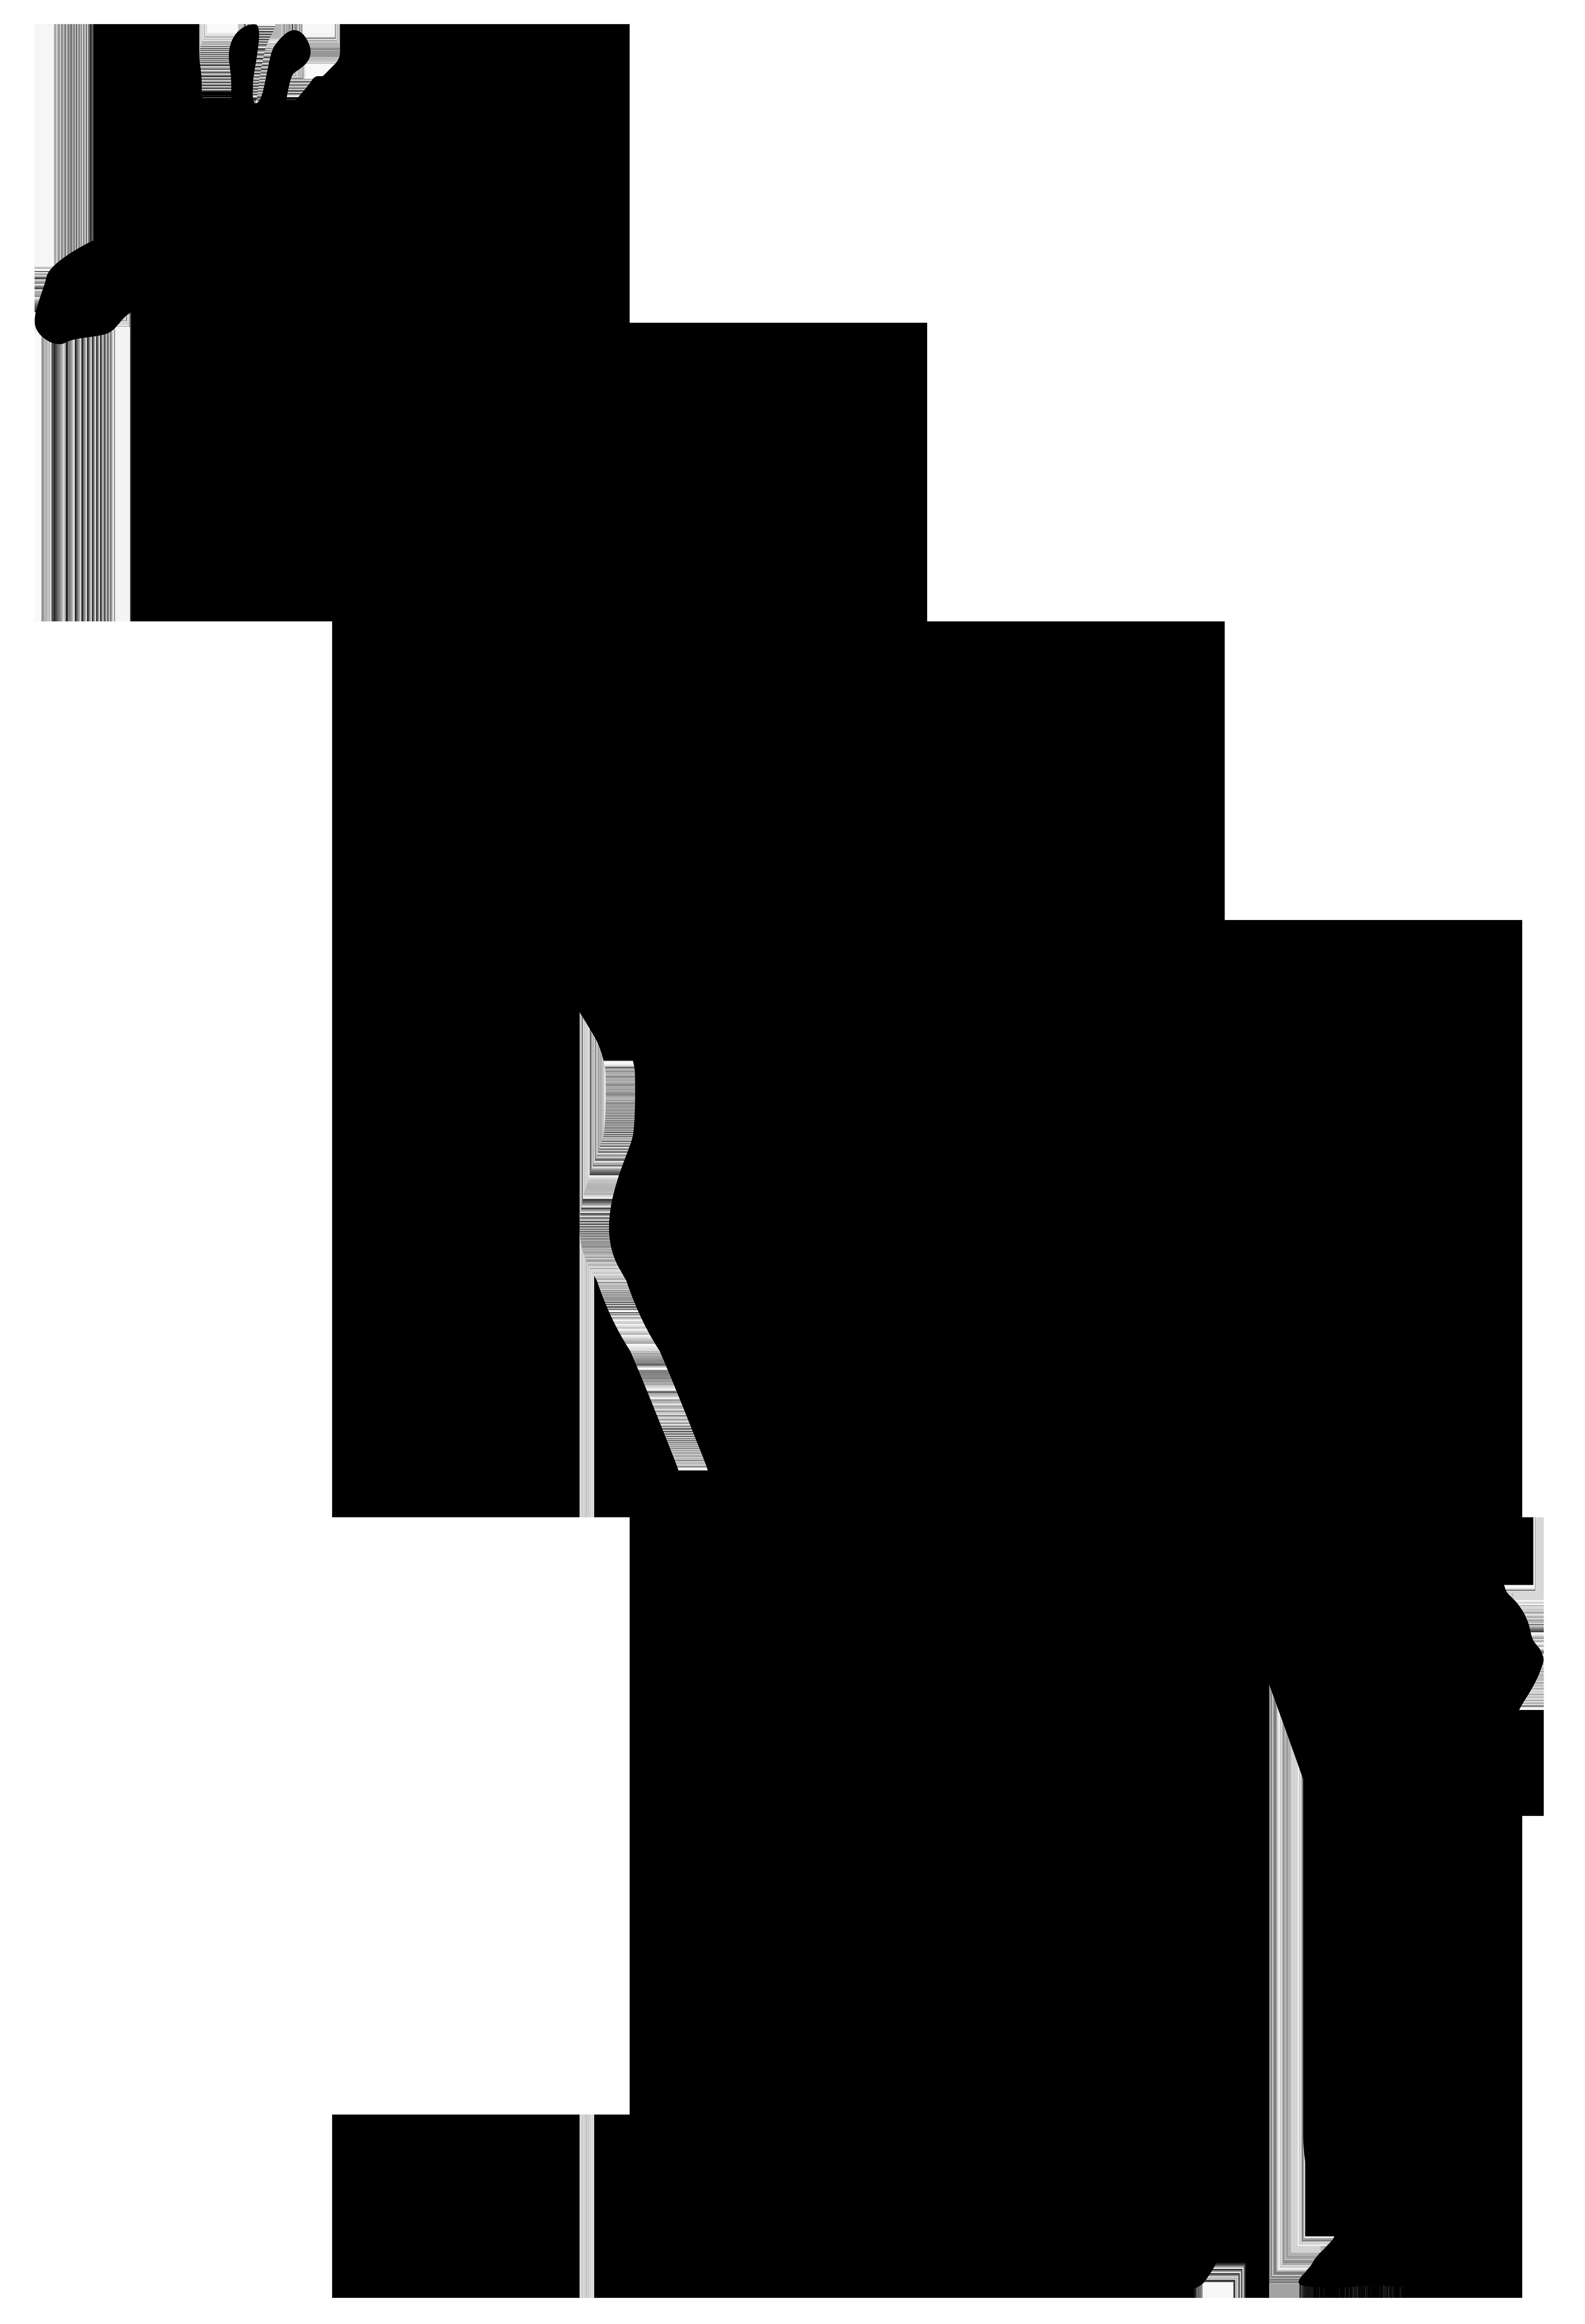 Giraffe Silhouette PNG Transparent Clip Art Image.